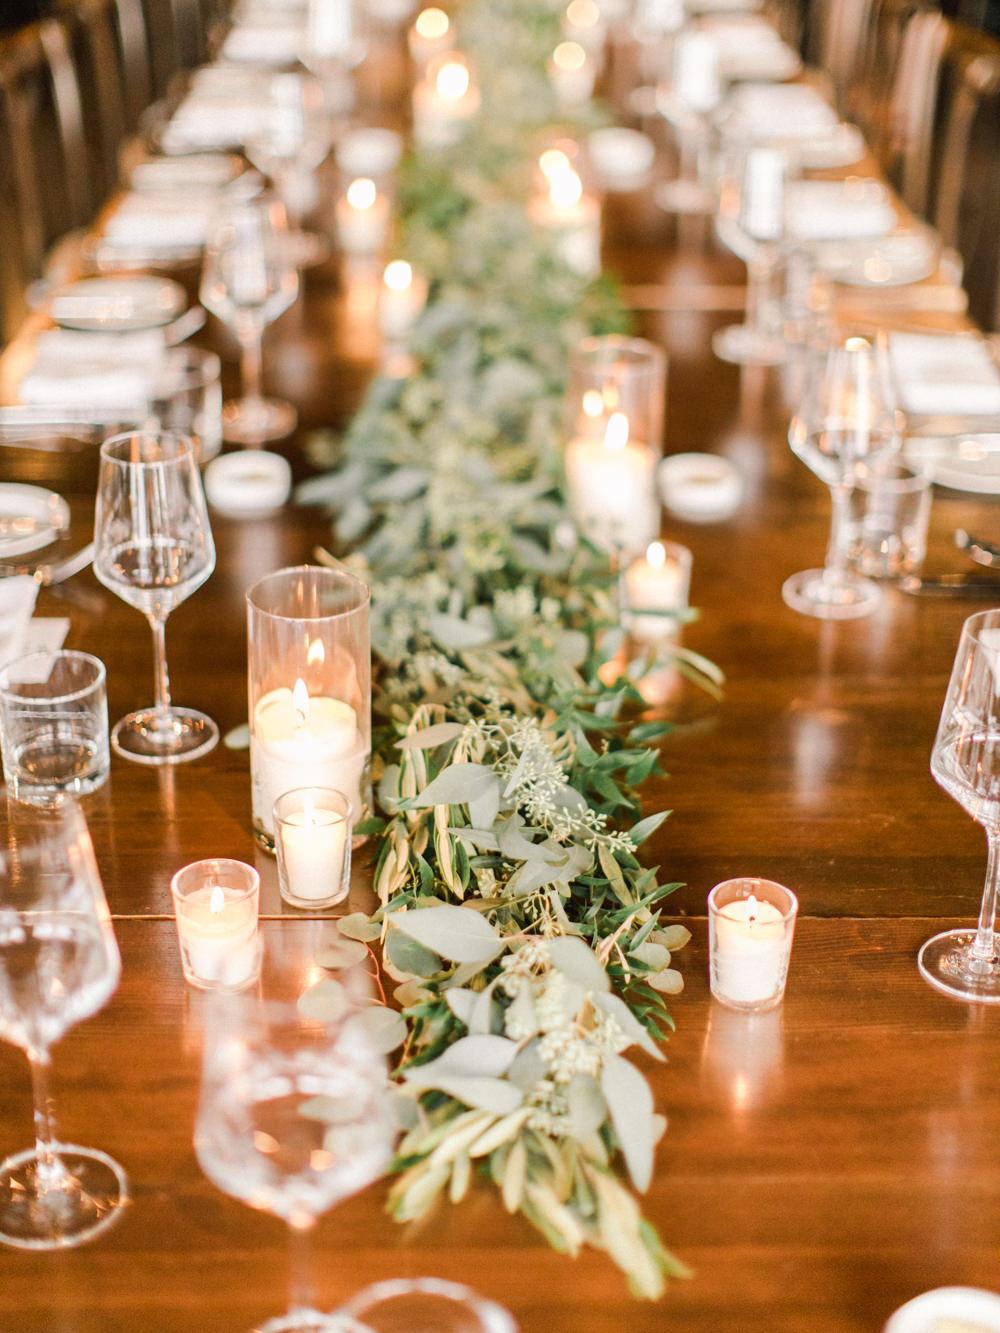 Breatt-and-Katies-romantic-Lake-house-wedding-Calgary-50.jpg